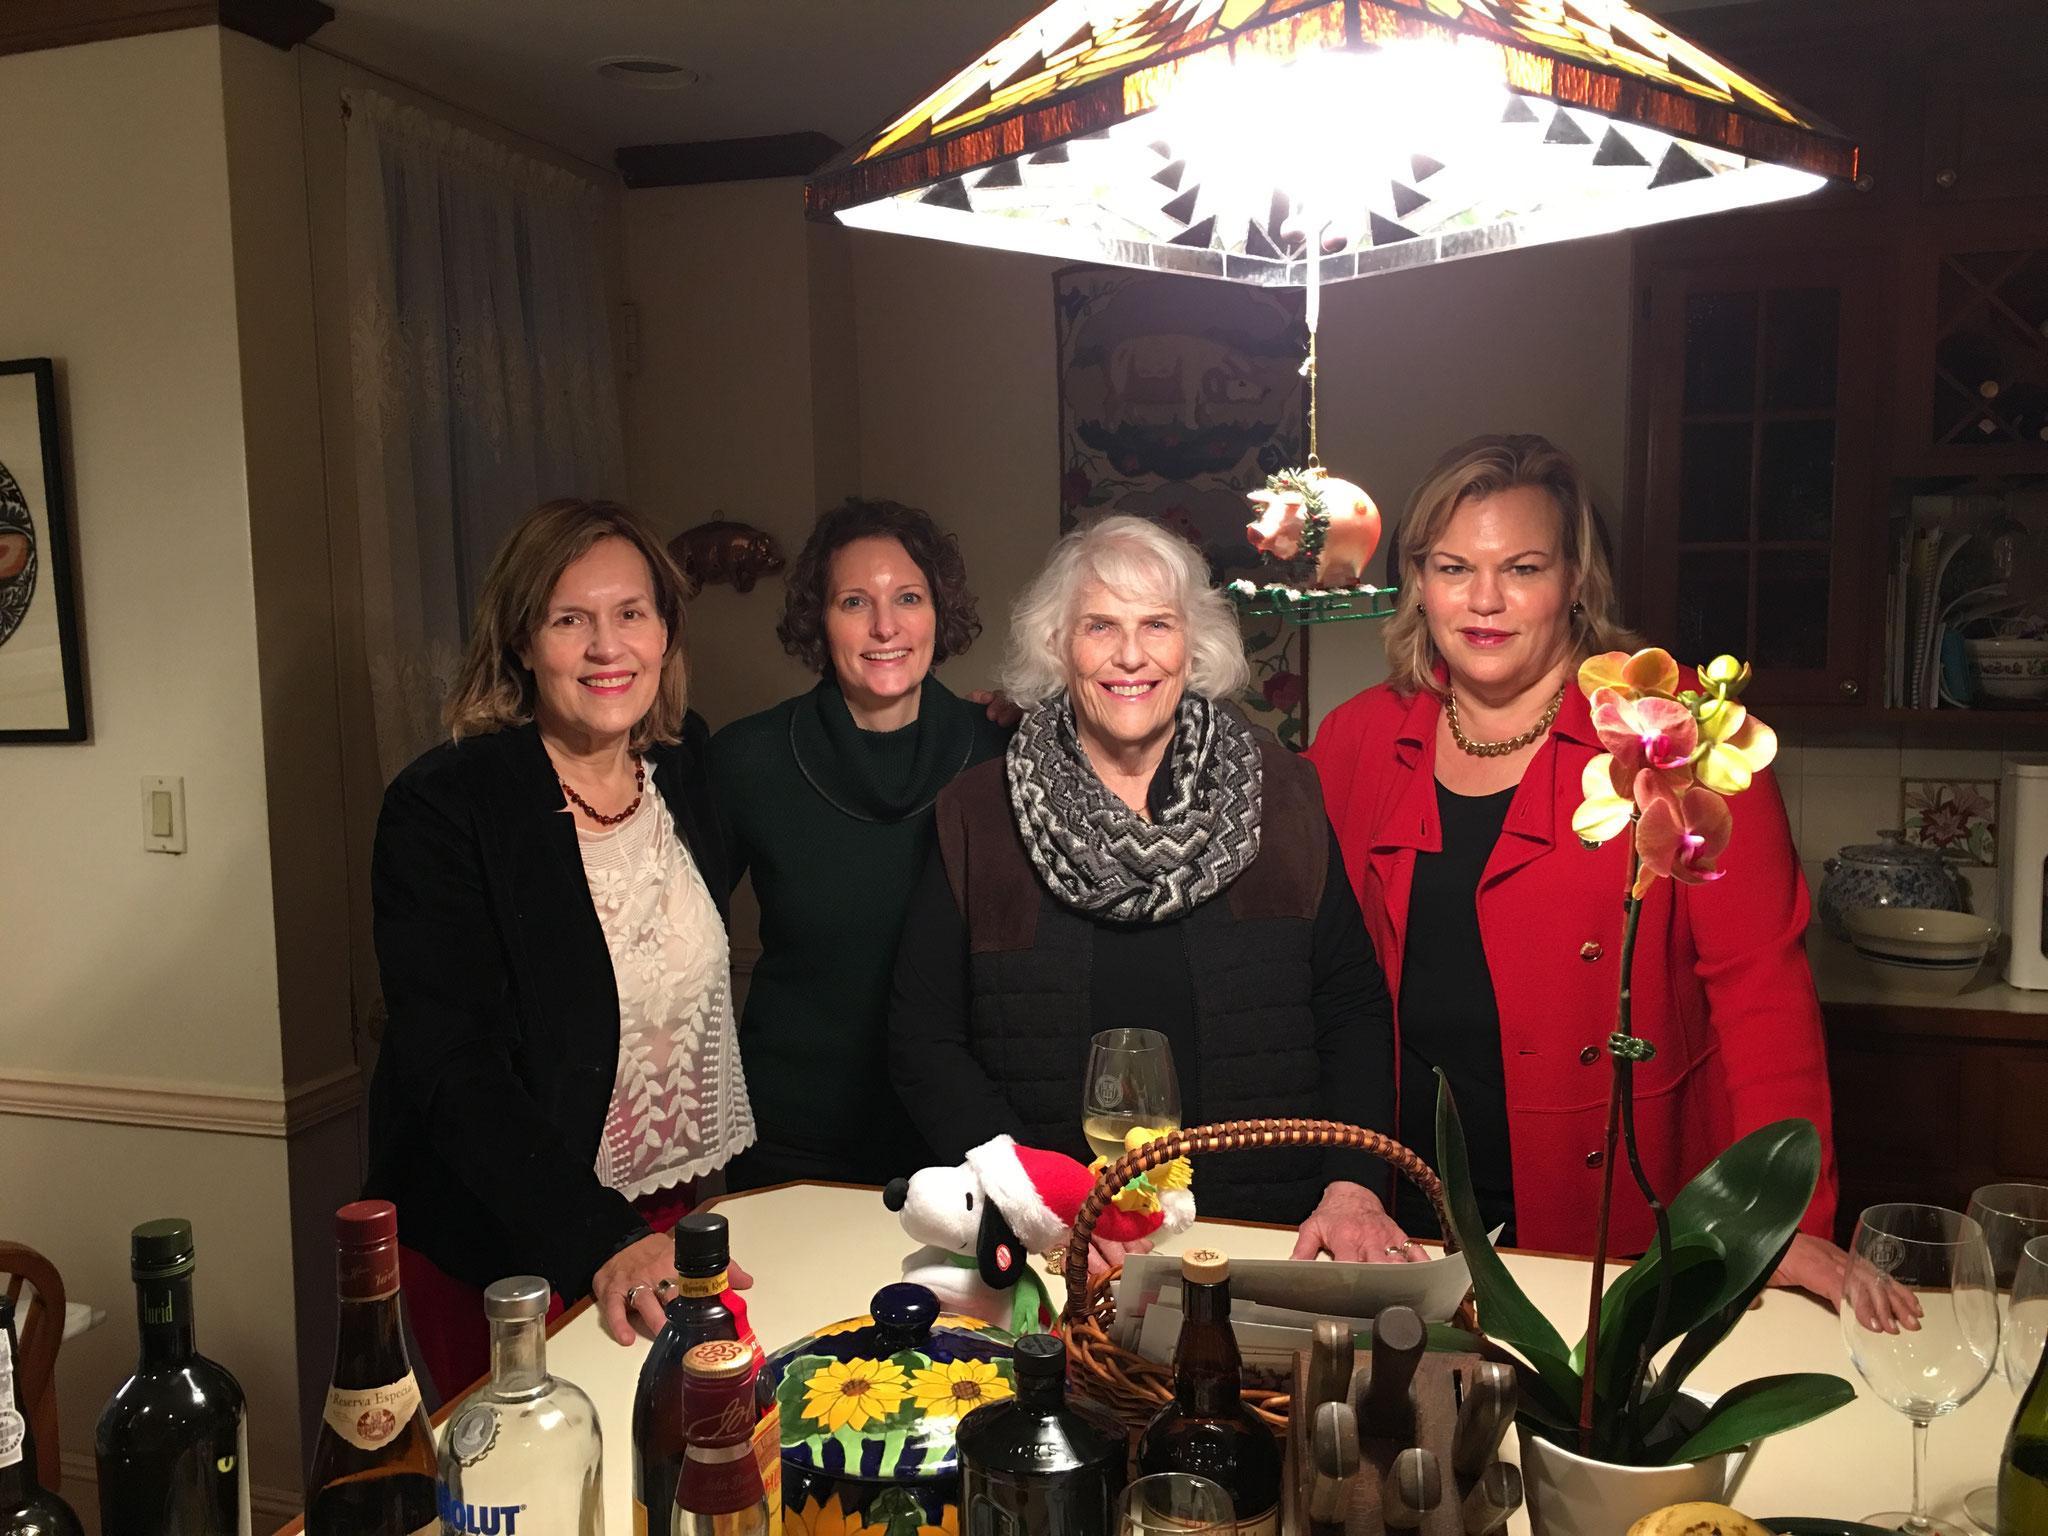 Lorraine Gudas, Lisa Kagel, Jane Kagel, Celeste